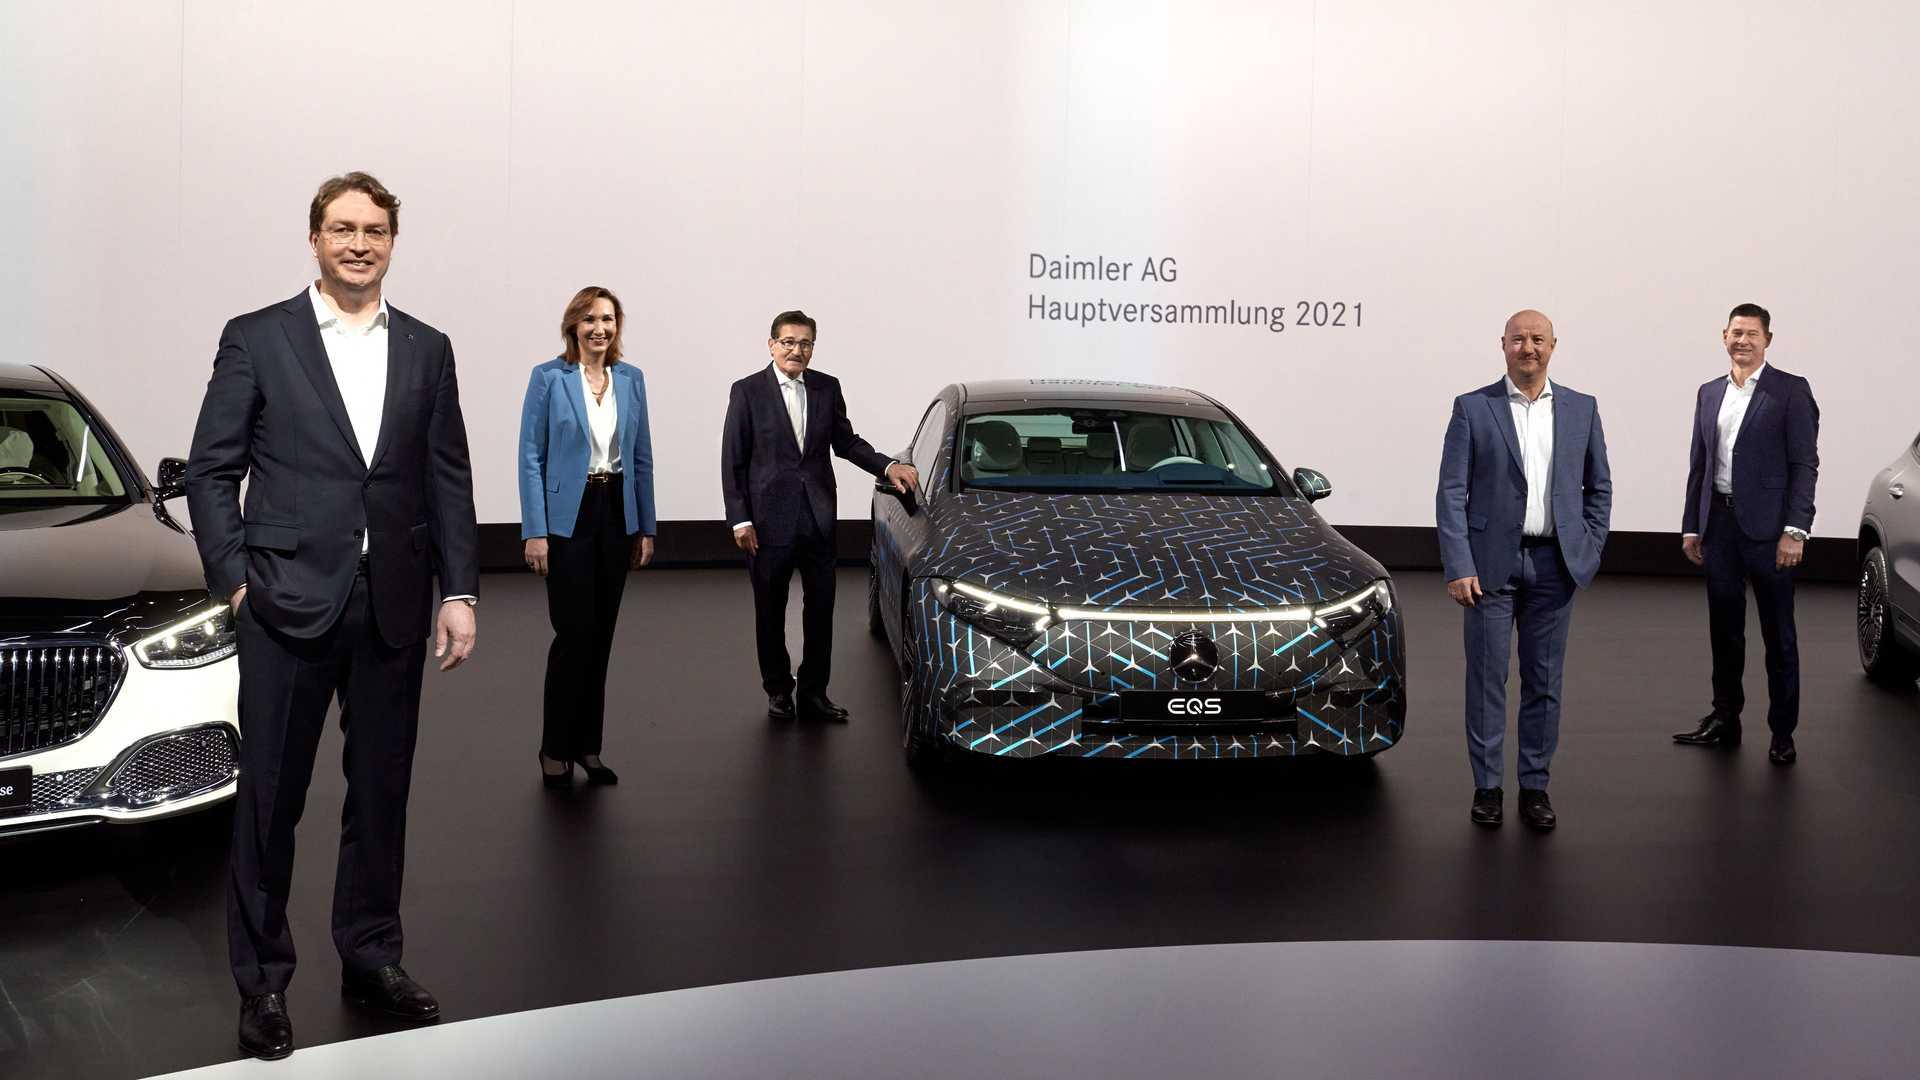 Mercedes Benz Eqs Daimler Ag